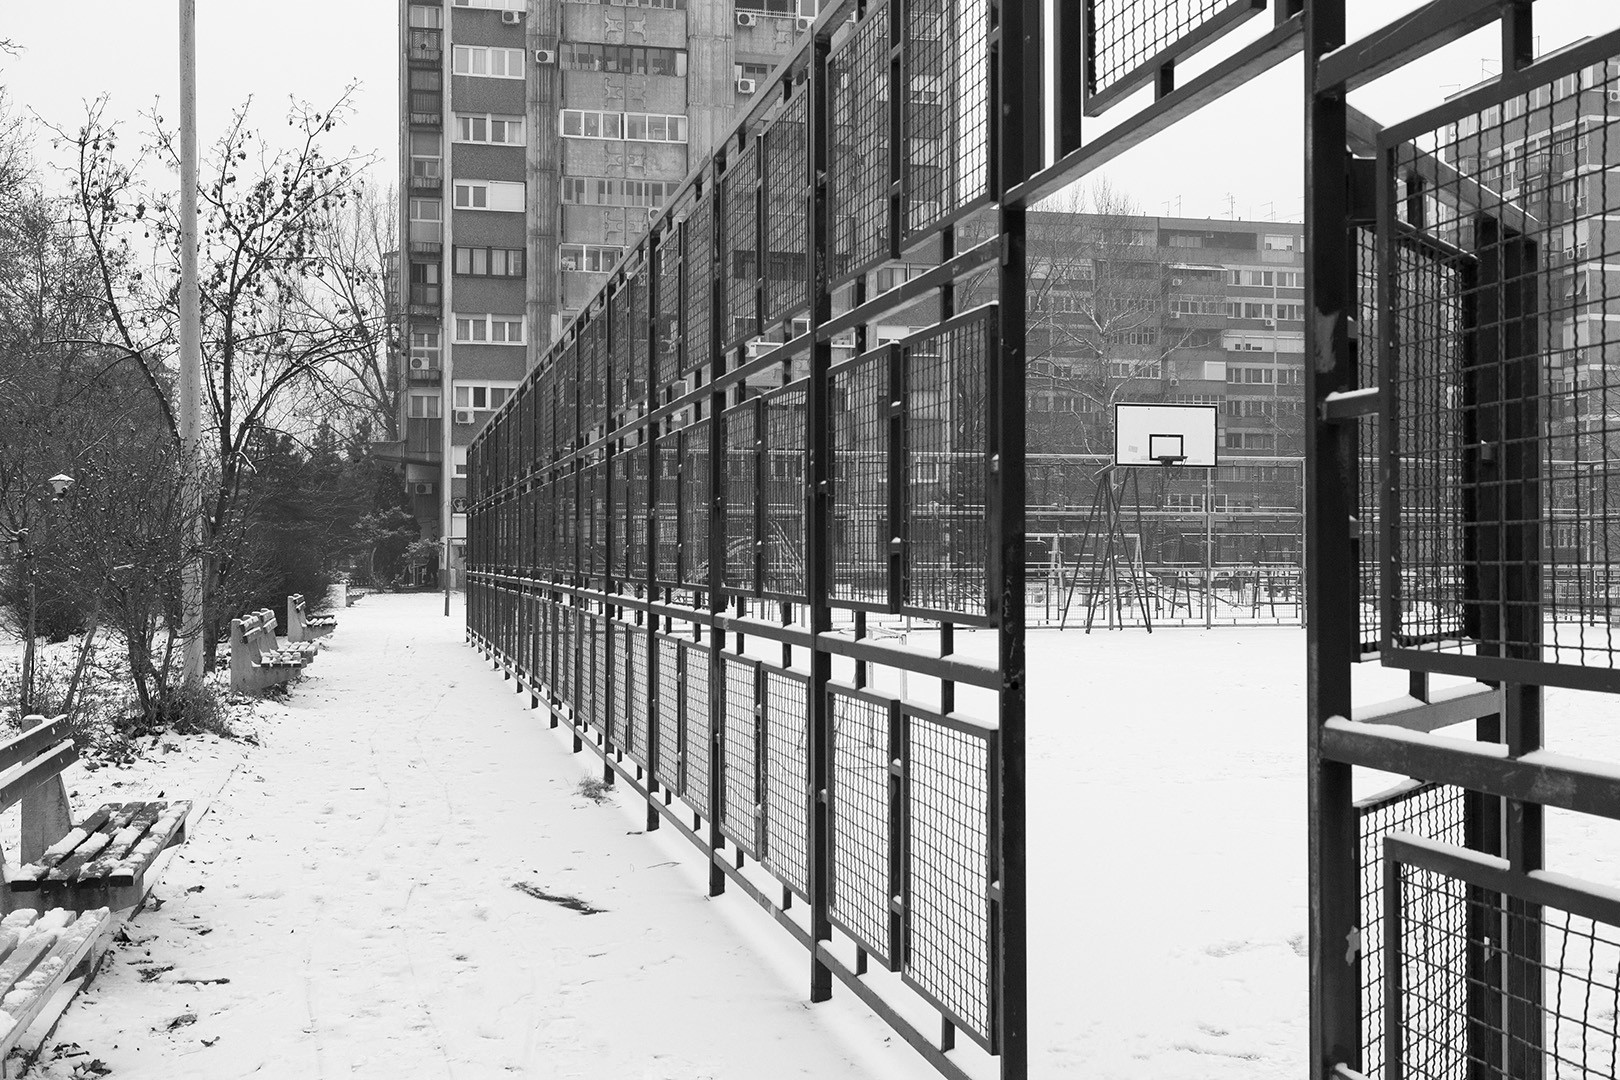 Zimska geometrija